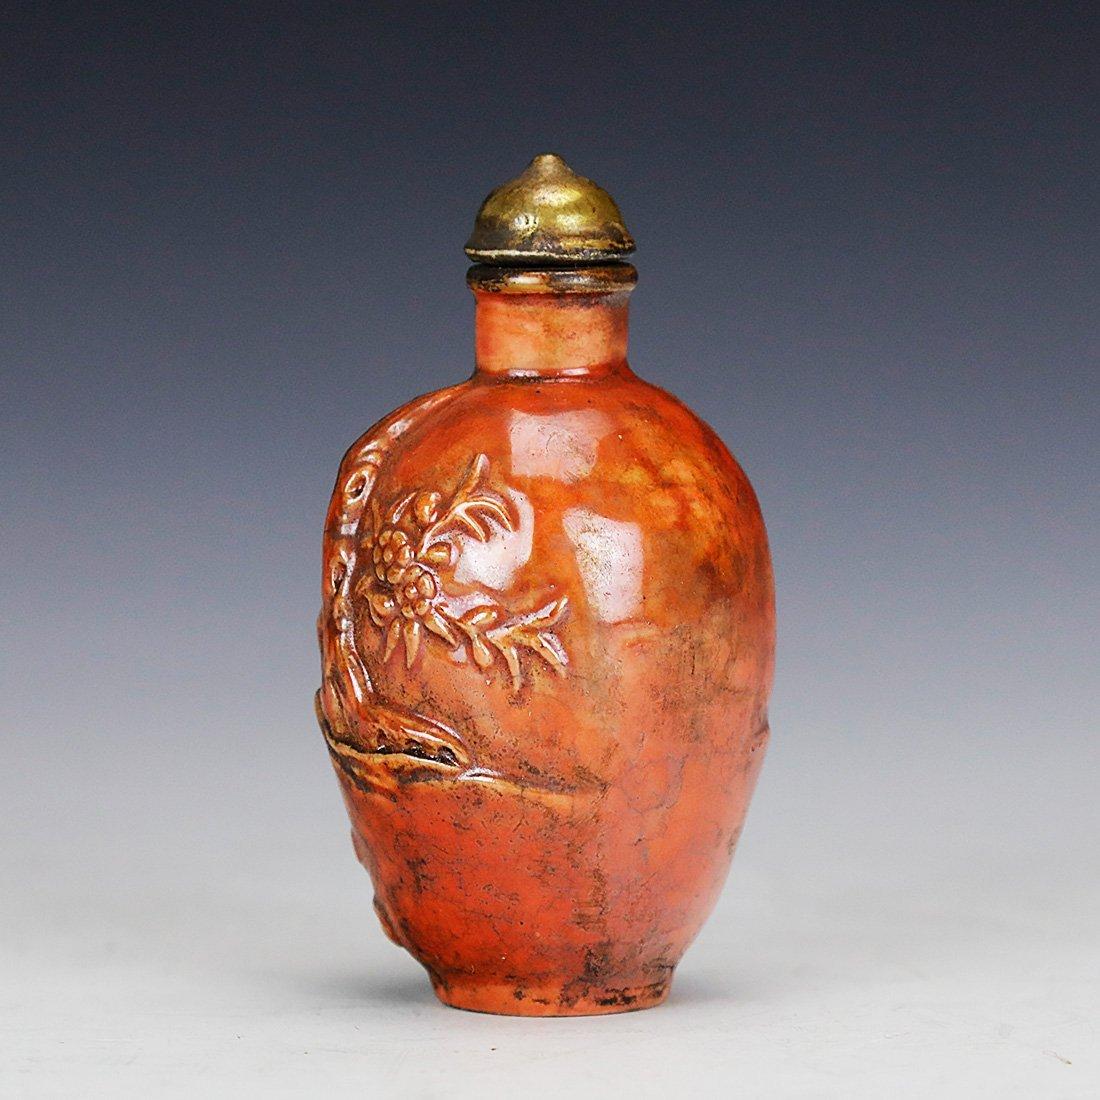 Asia Hand painted ceramic snuff bottle ,18 century - 3